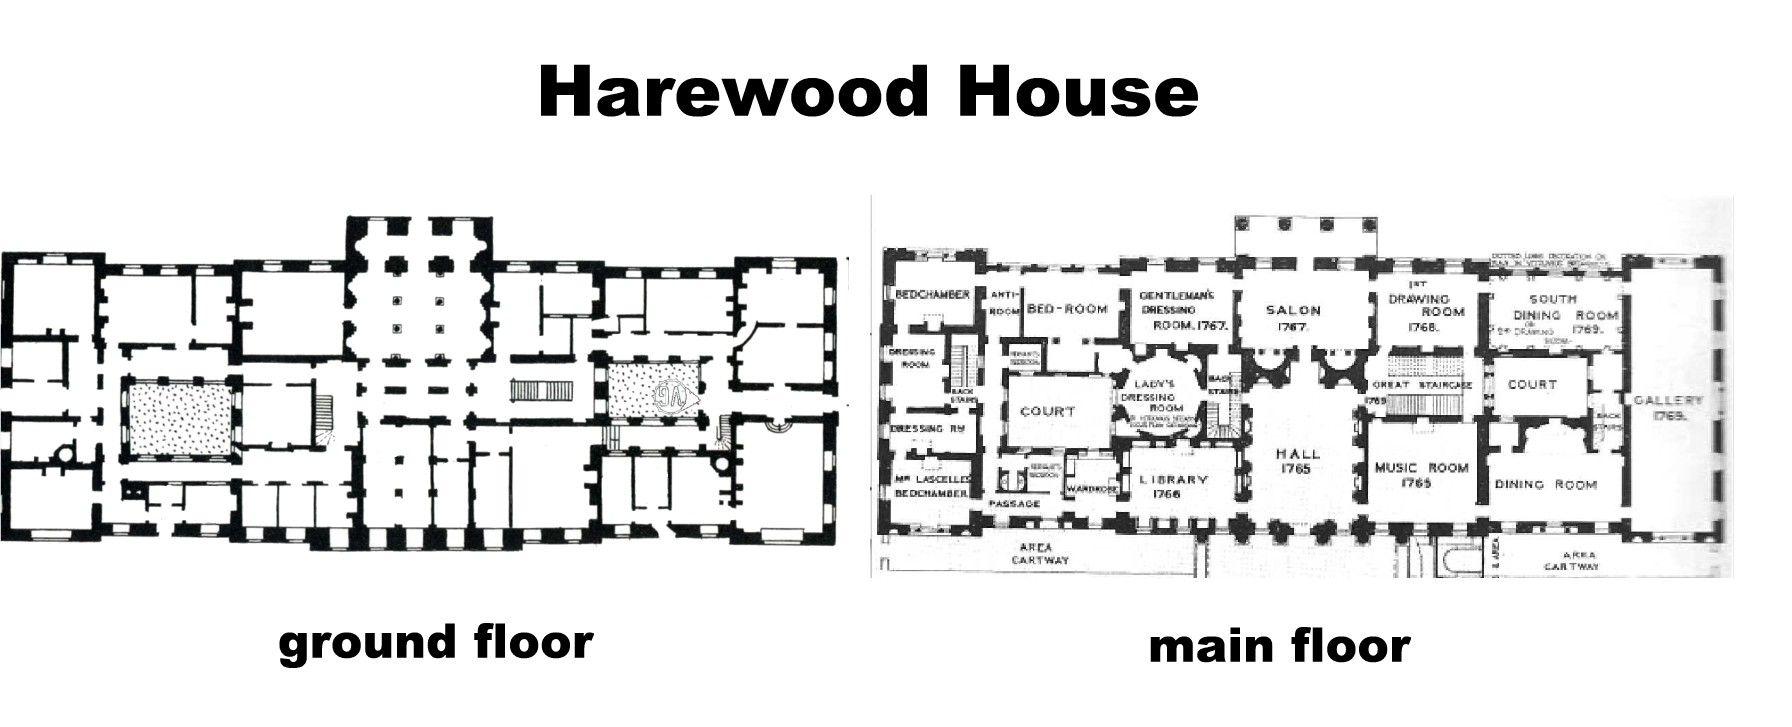 Home house design vintage victorian floor plans totchcv for Harewood house garden design